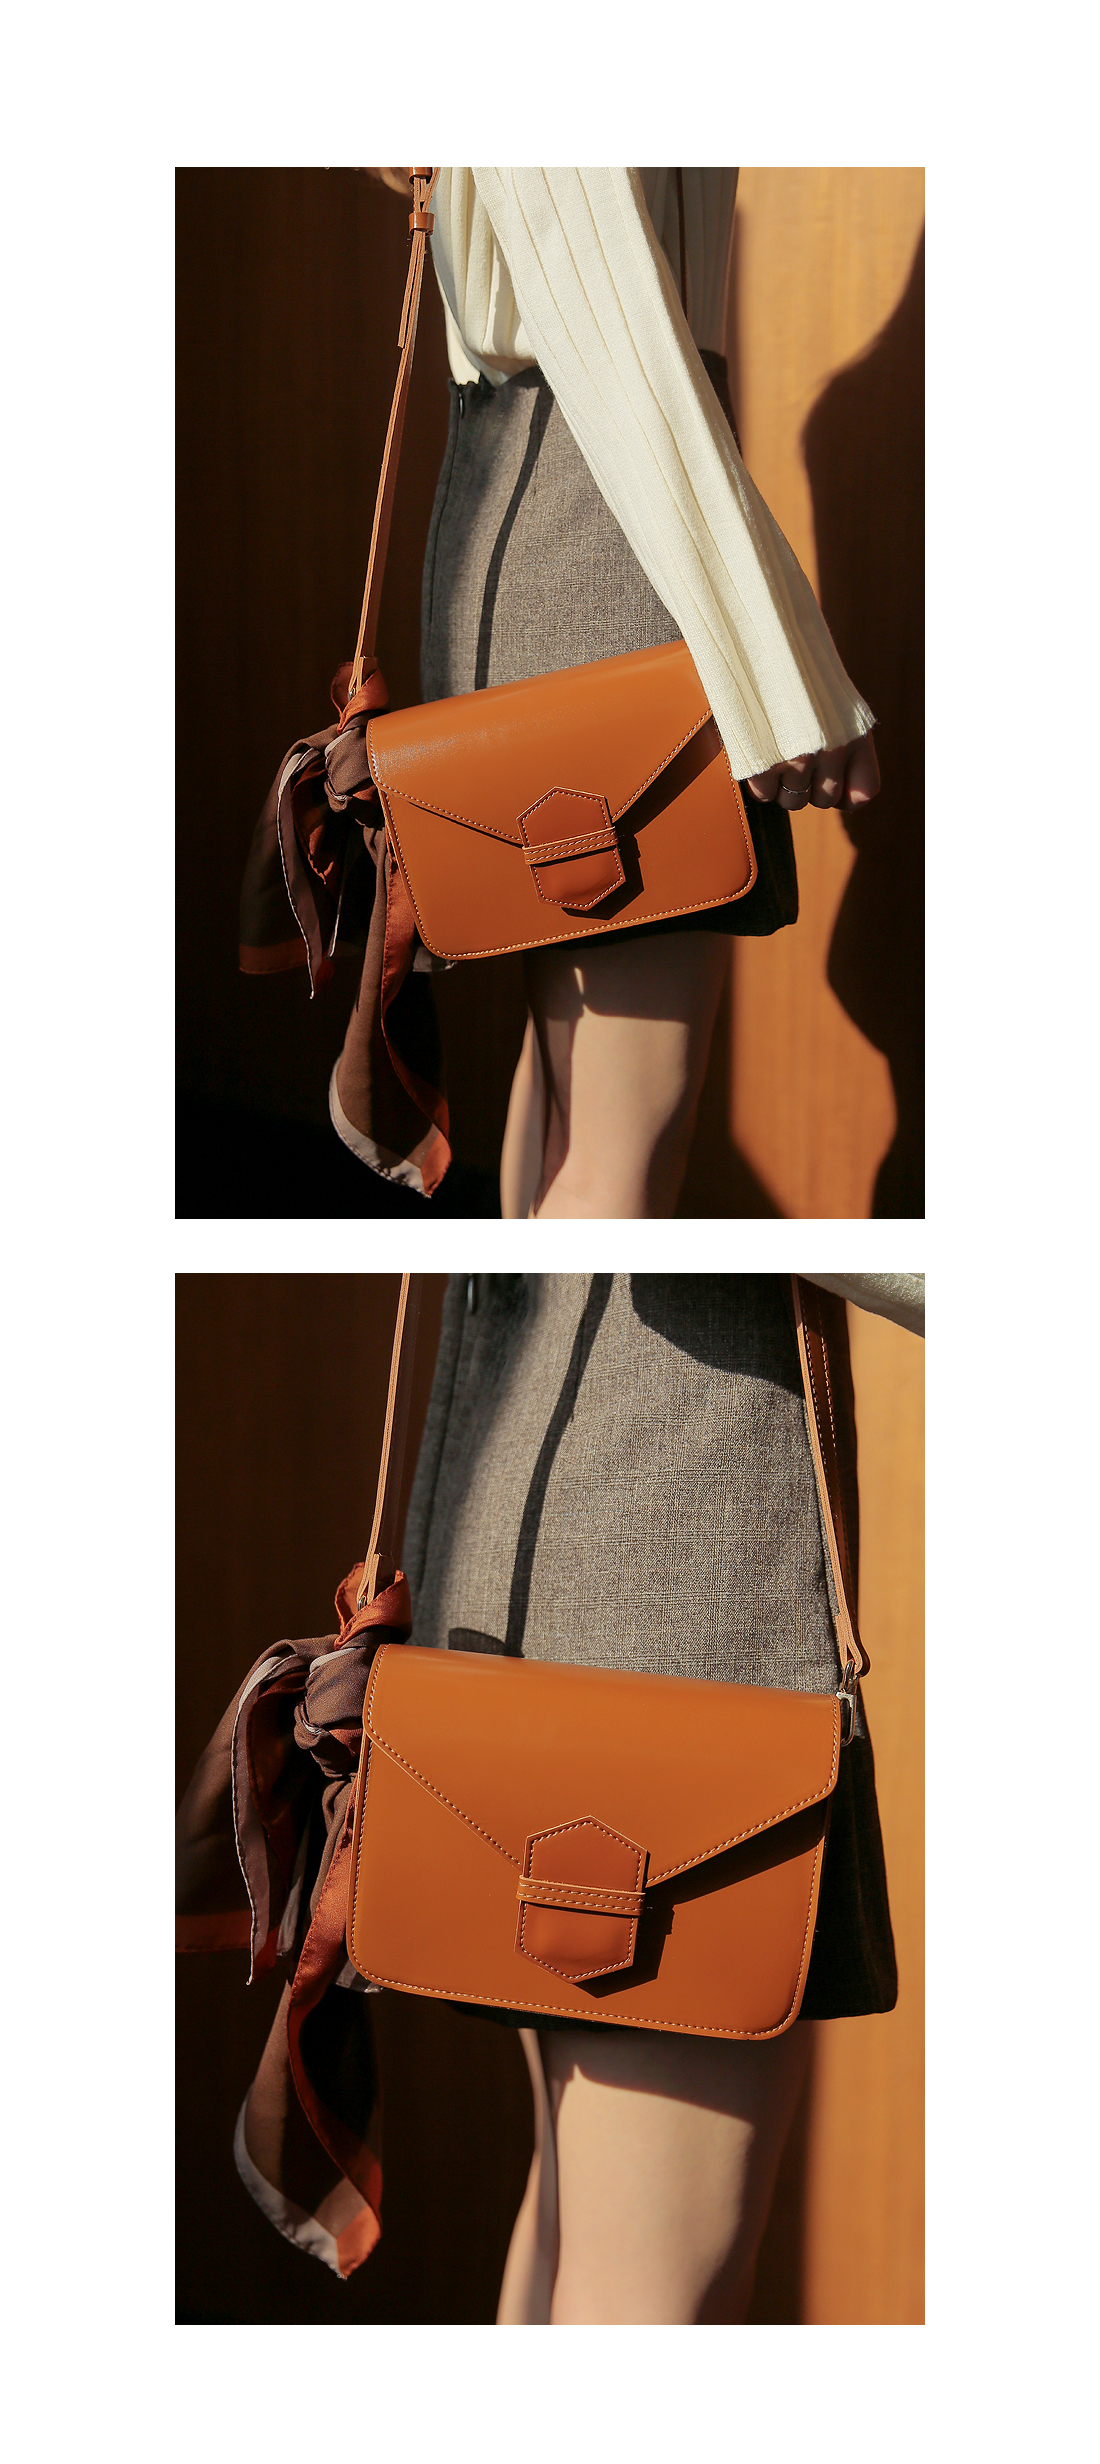 [BAG] 5 COLOR REFINED LEATHER BAG